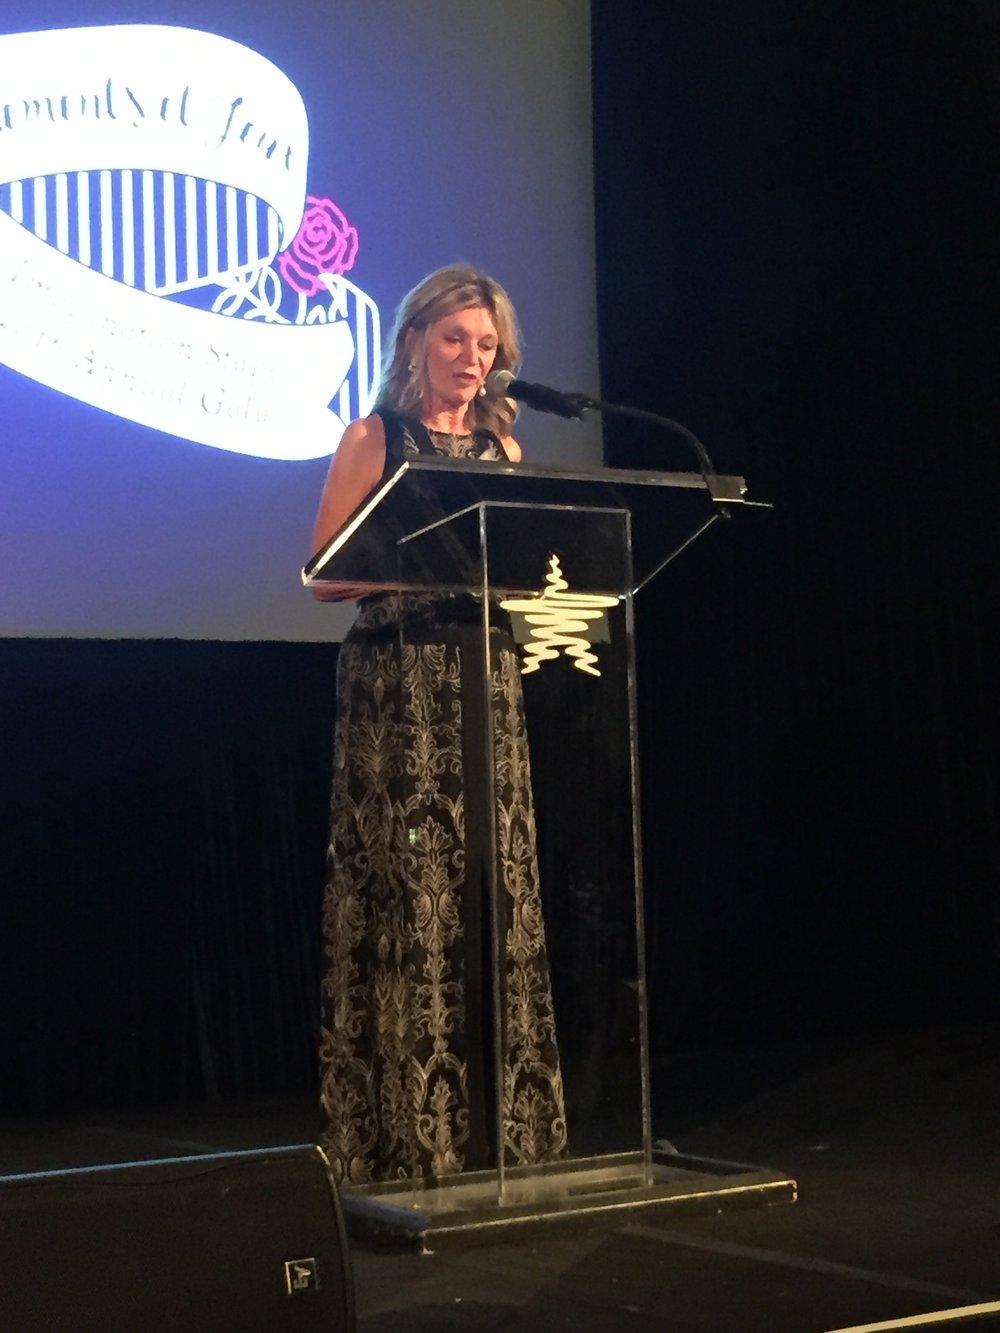 Kay Kendall introducing Septime Webre